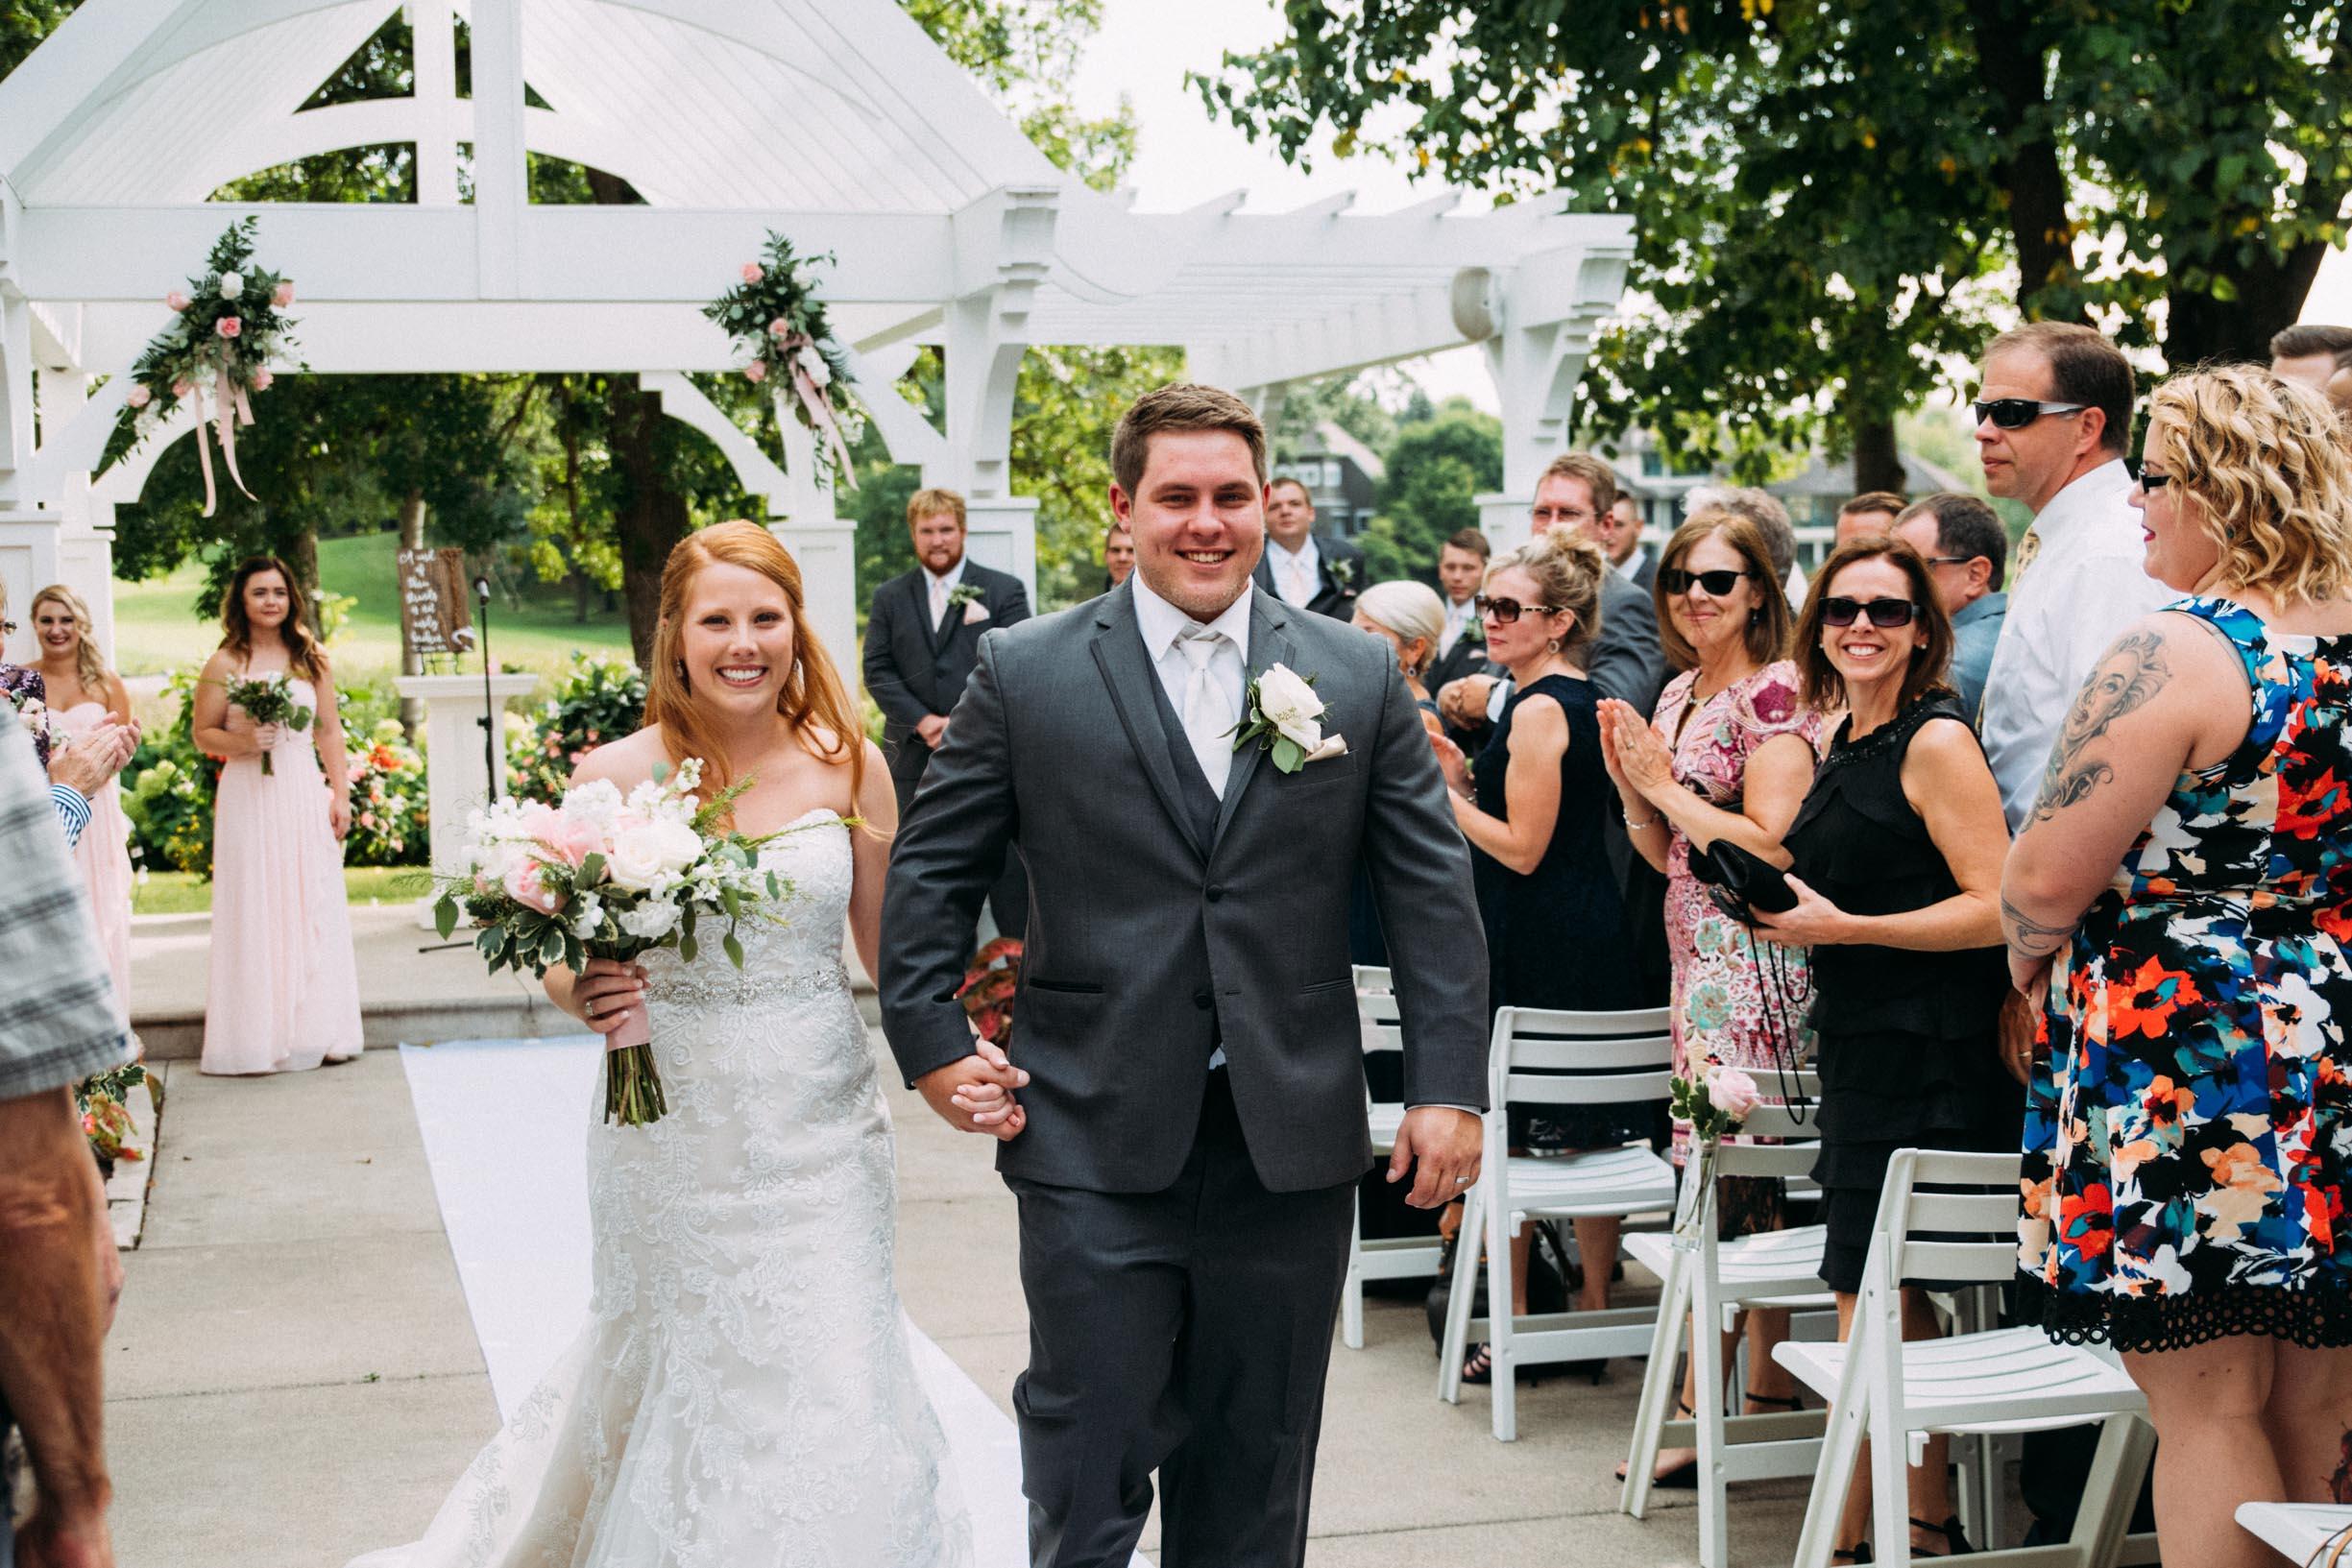 Megan_Zach_Minneapolis_Wedding_Ceremony_Blog-40.jpg